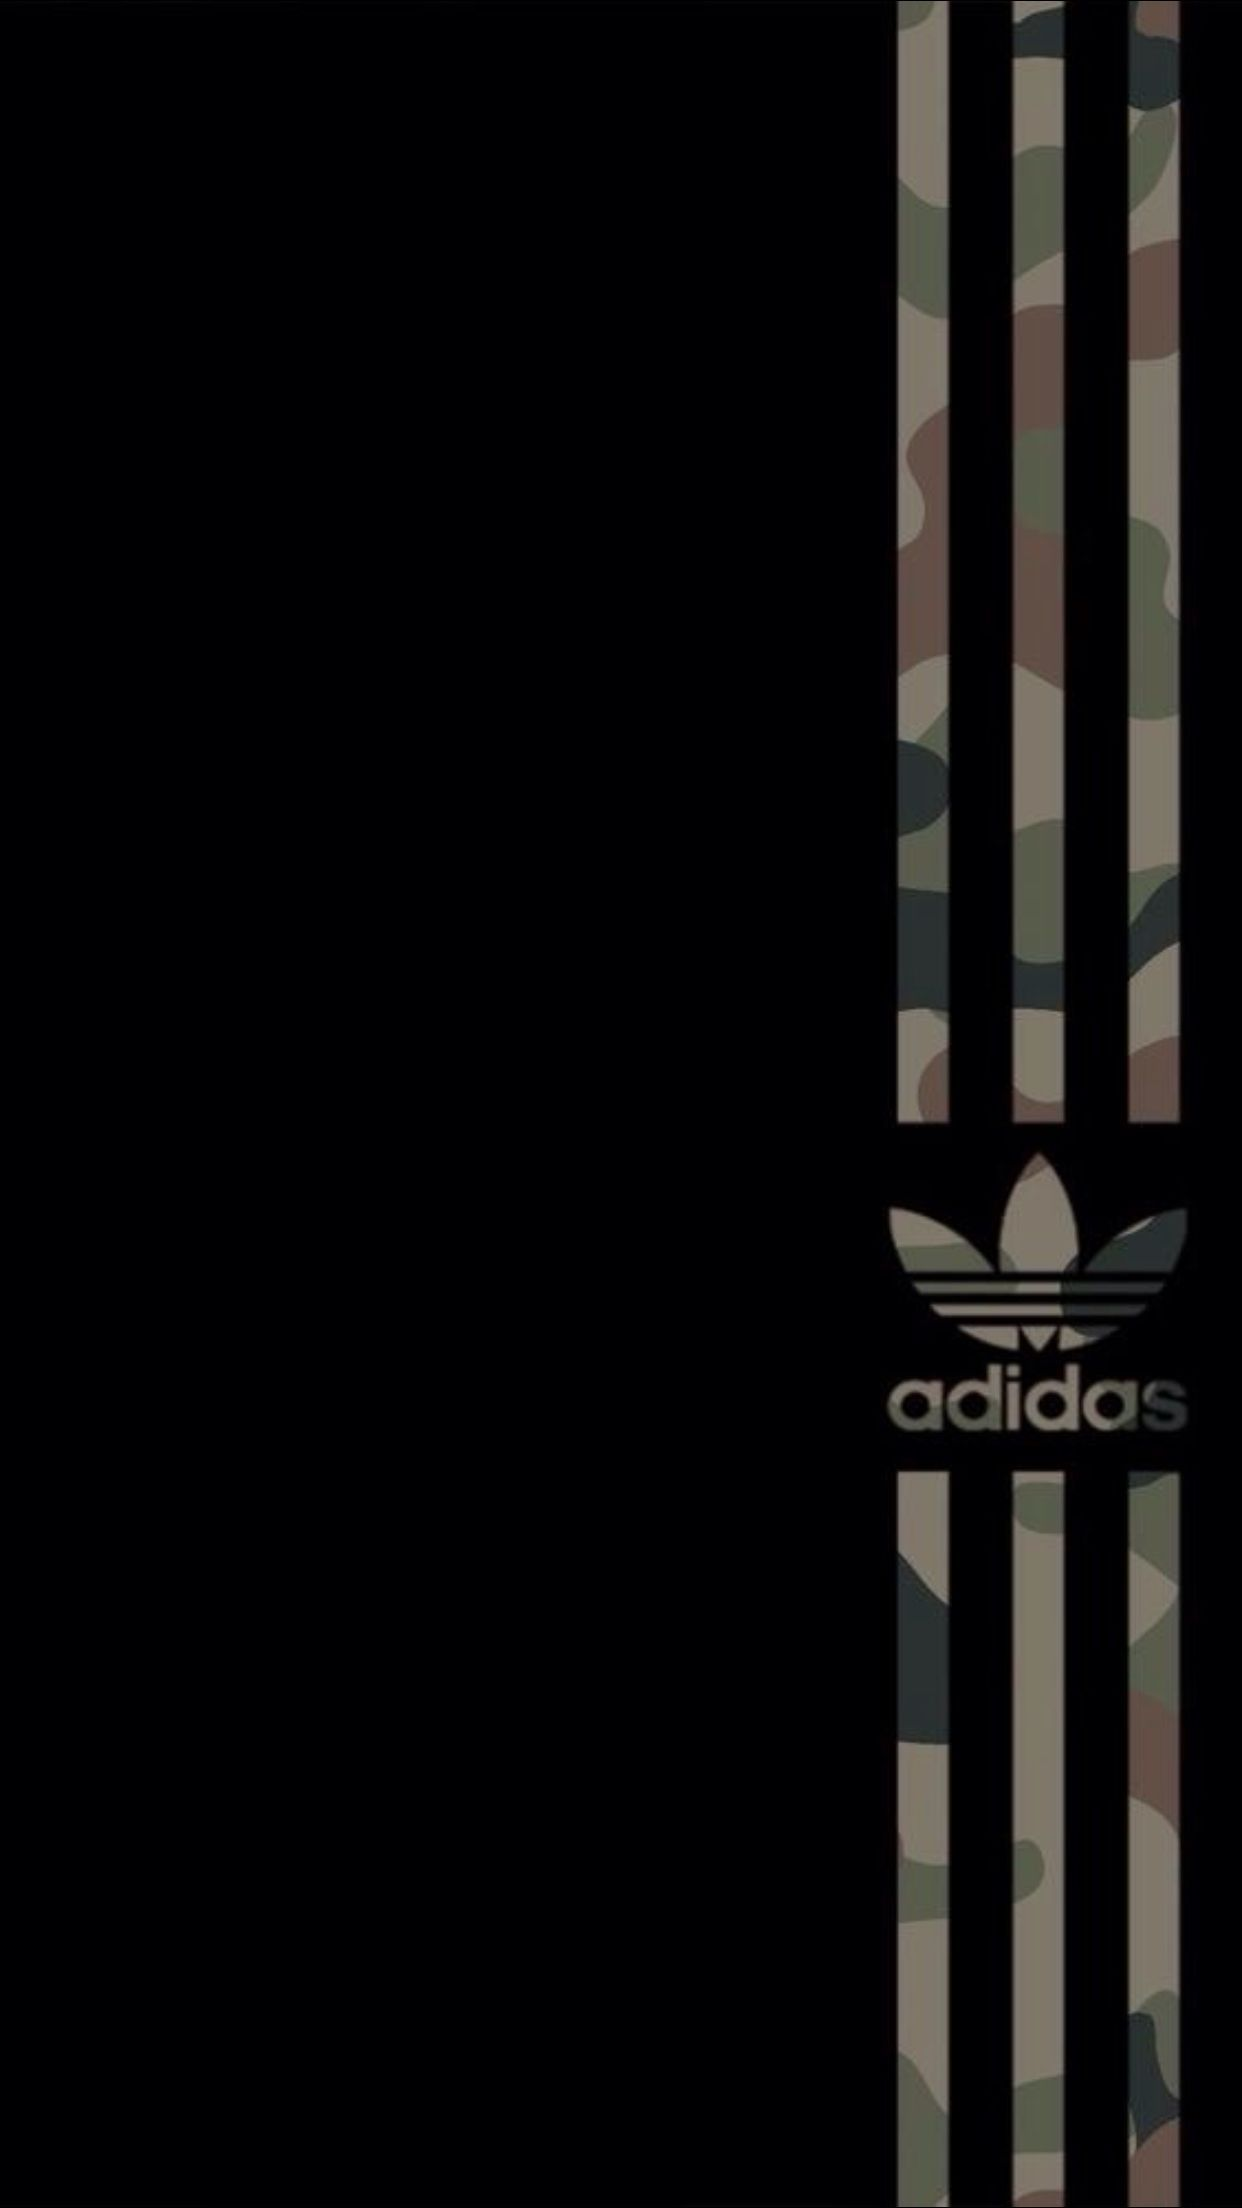 Wallpaper In Adidas Wallpapers Swag Wallpaper Adidas Iphone Wallpaper